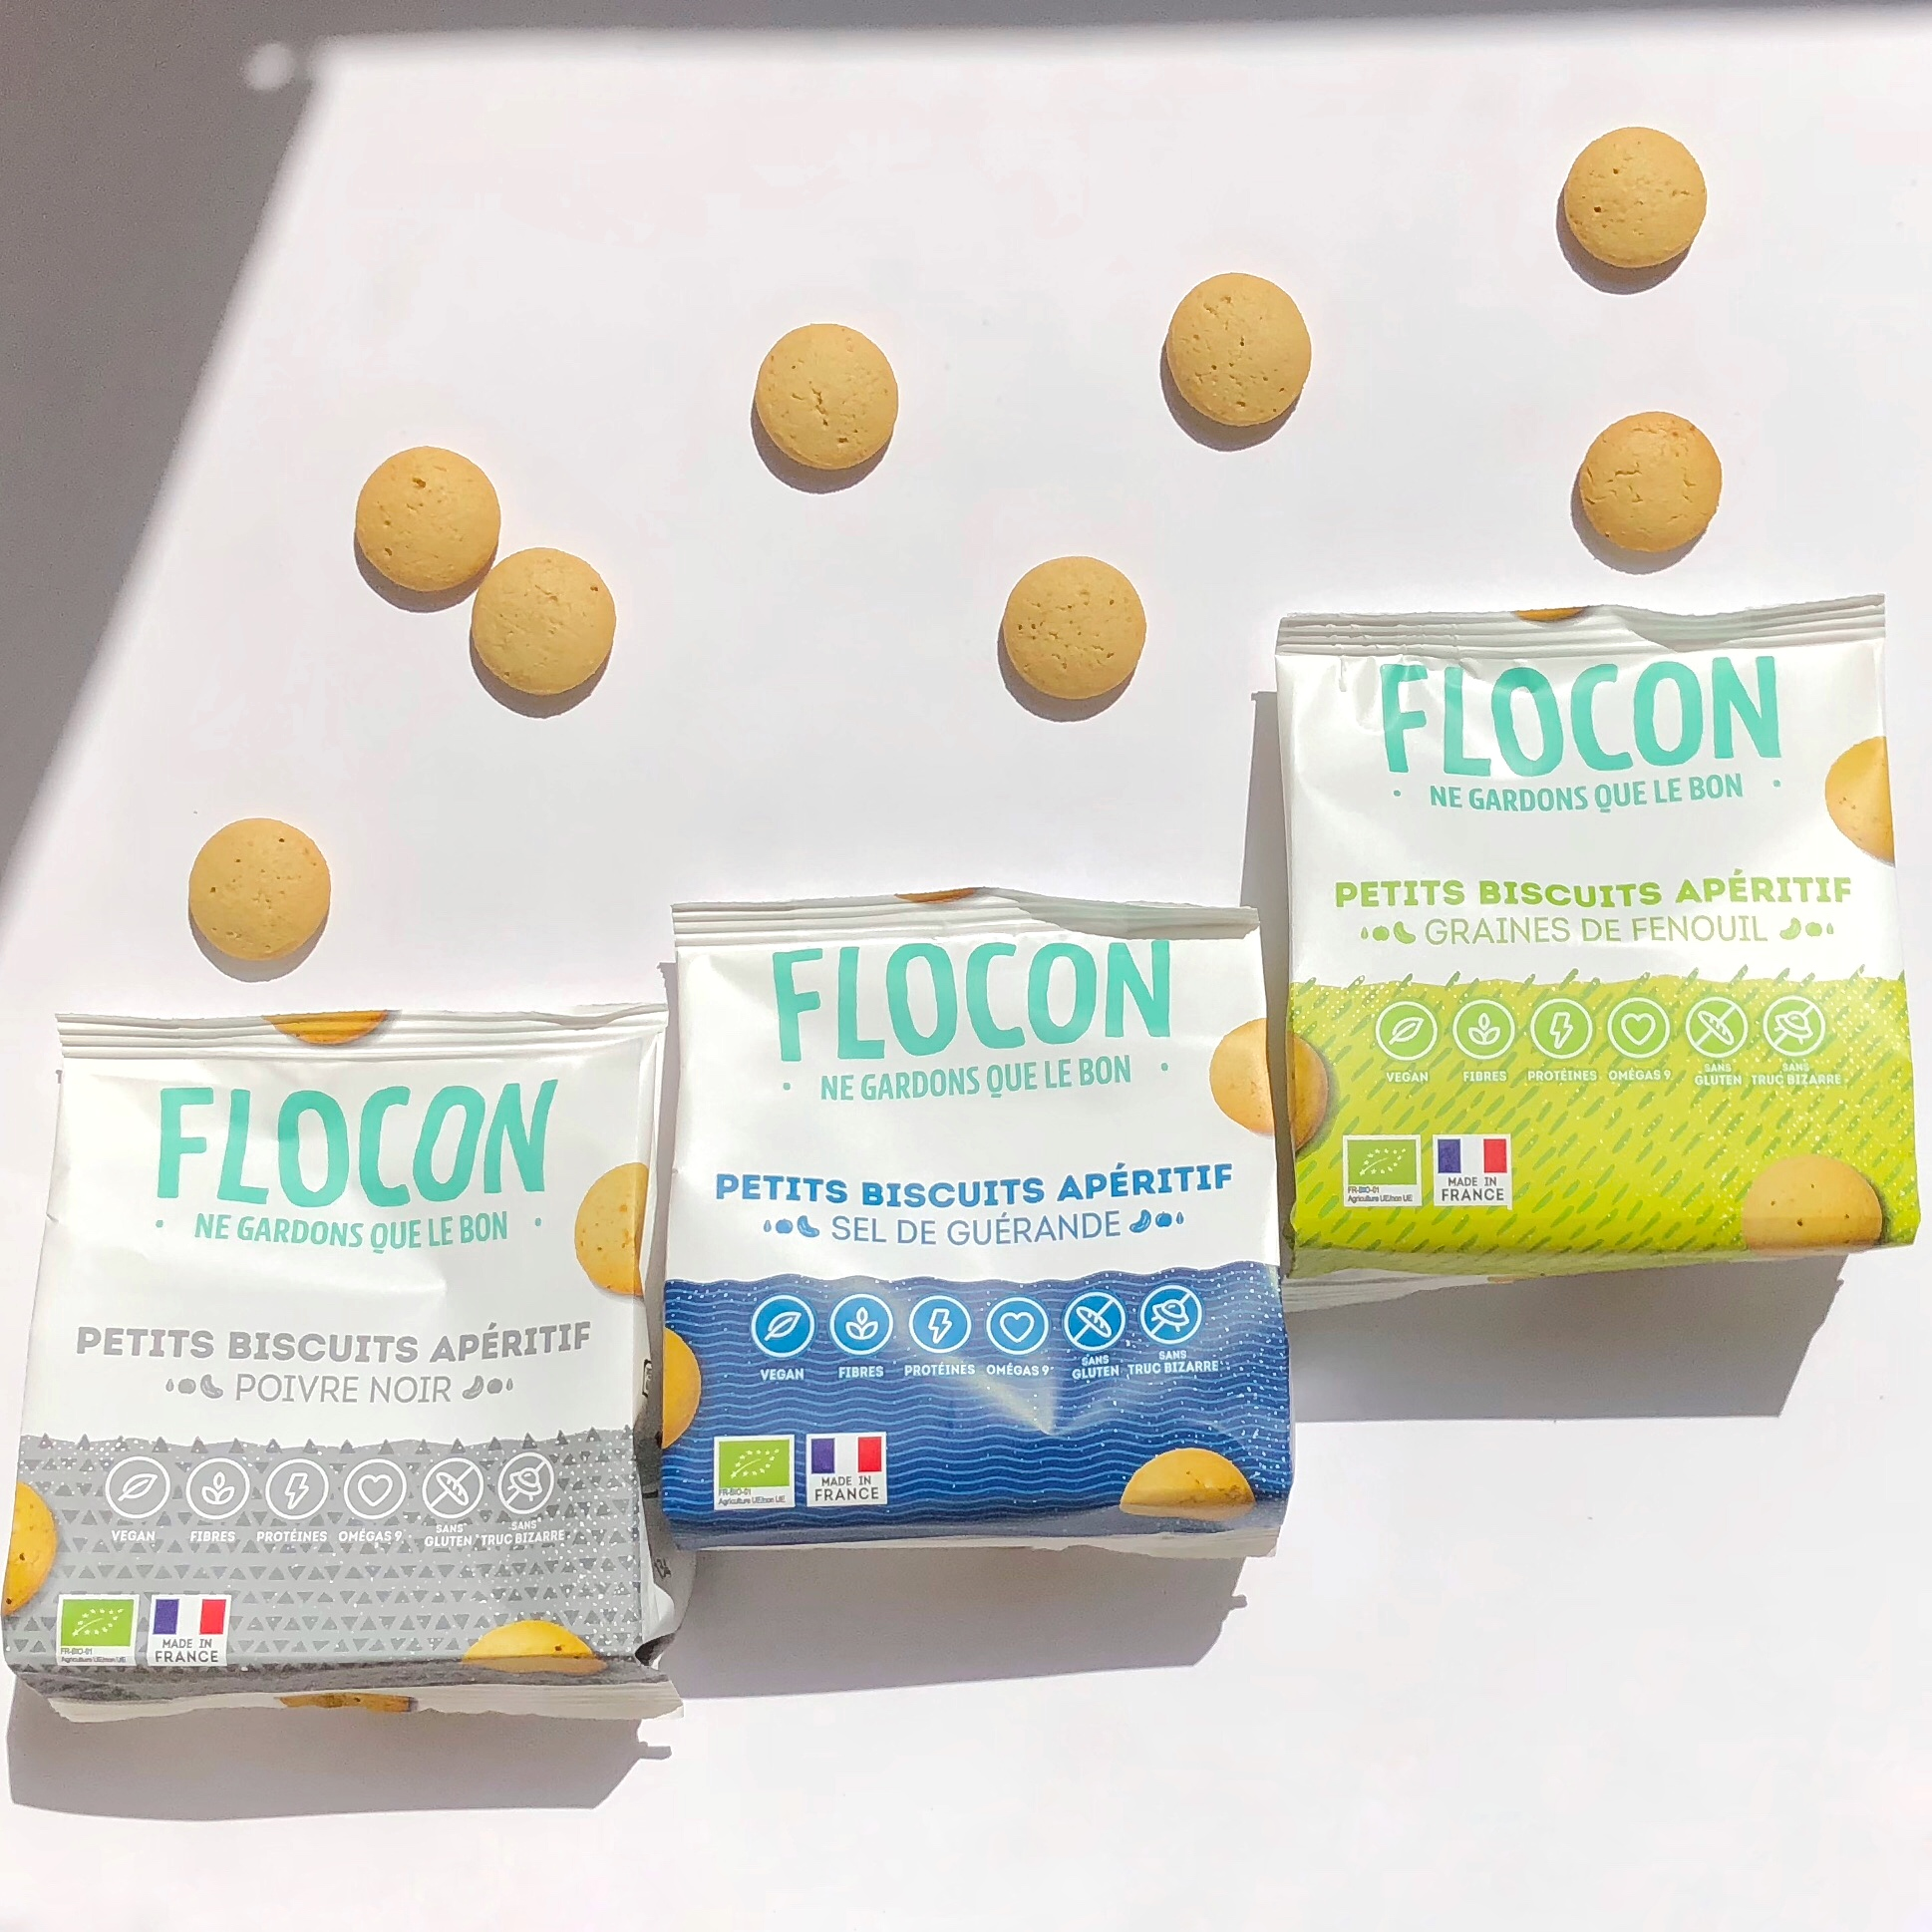 FLOCON